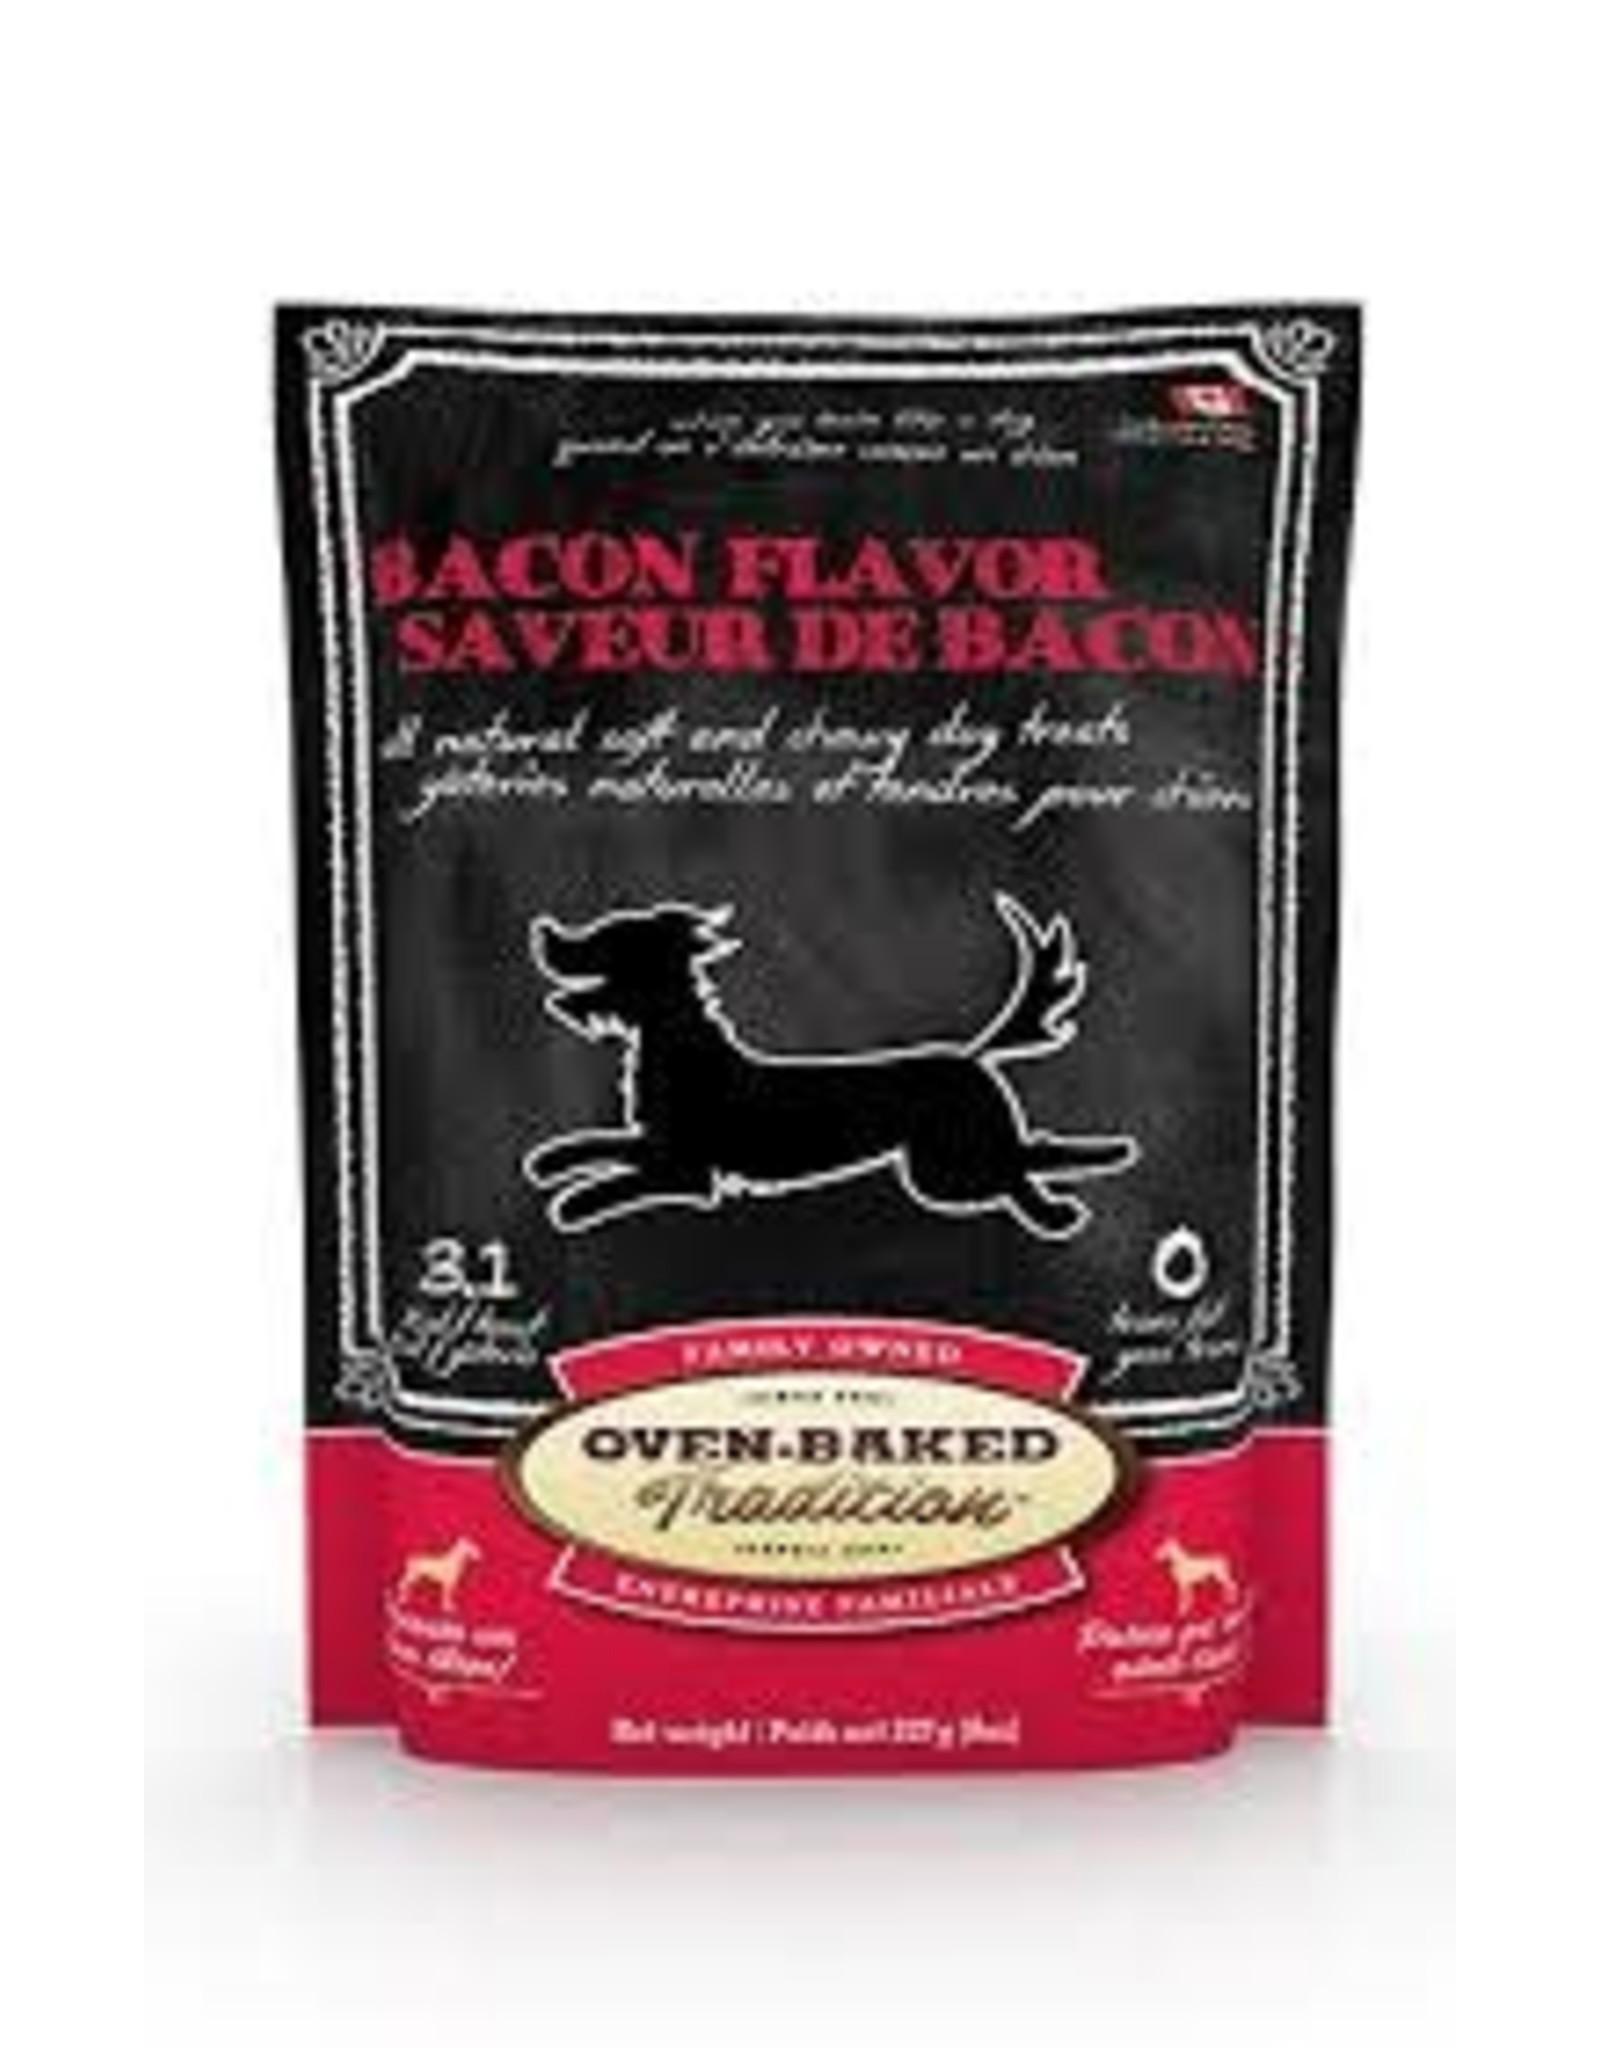 Oven-Baked Tradition Oven-Baked Tradition - Bacon Treats 8oz